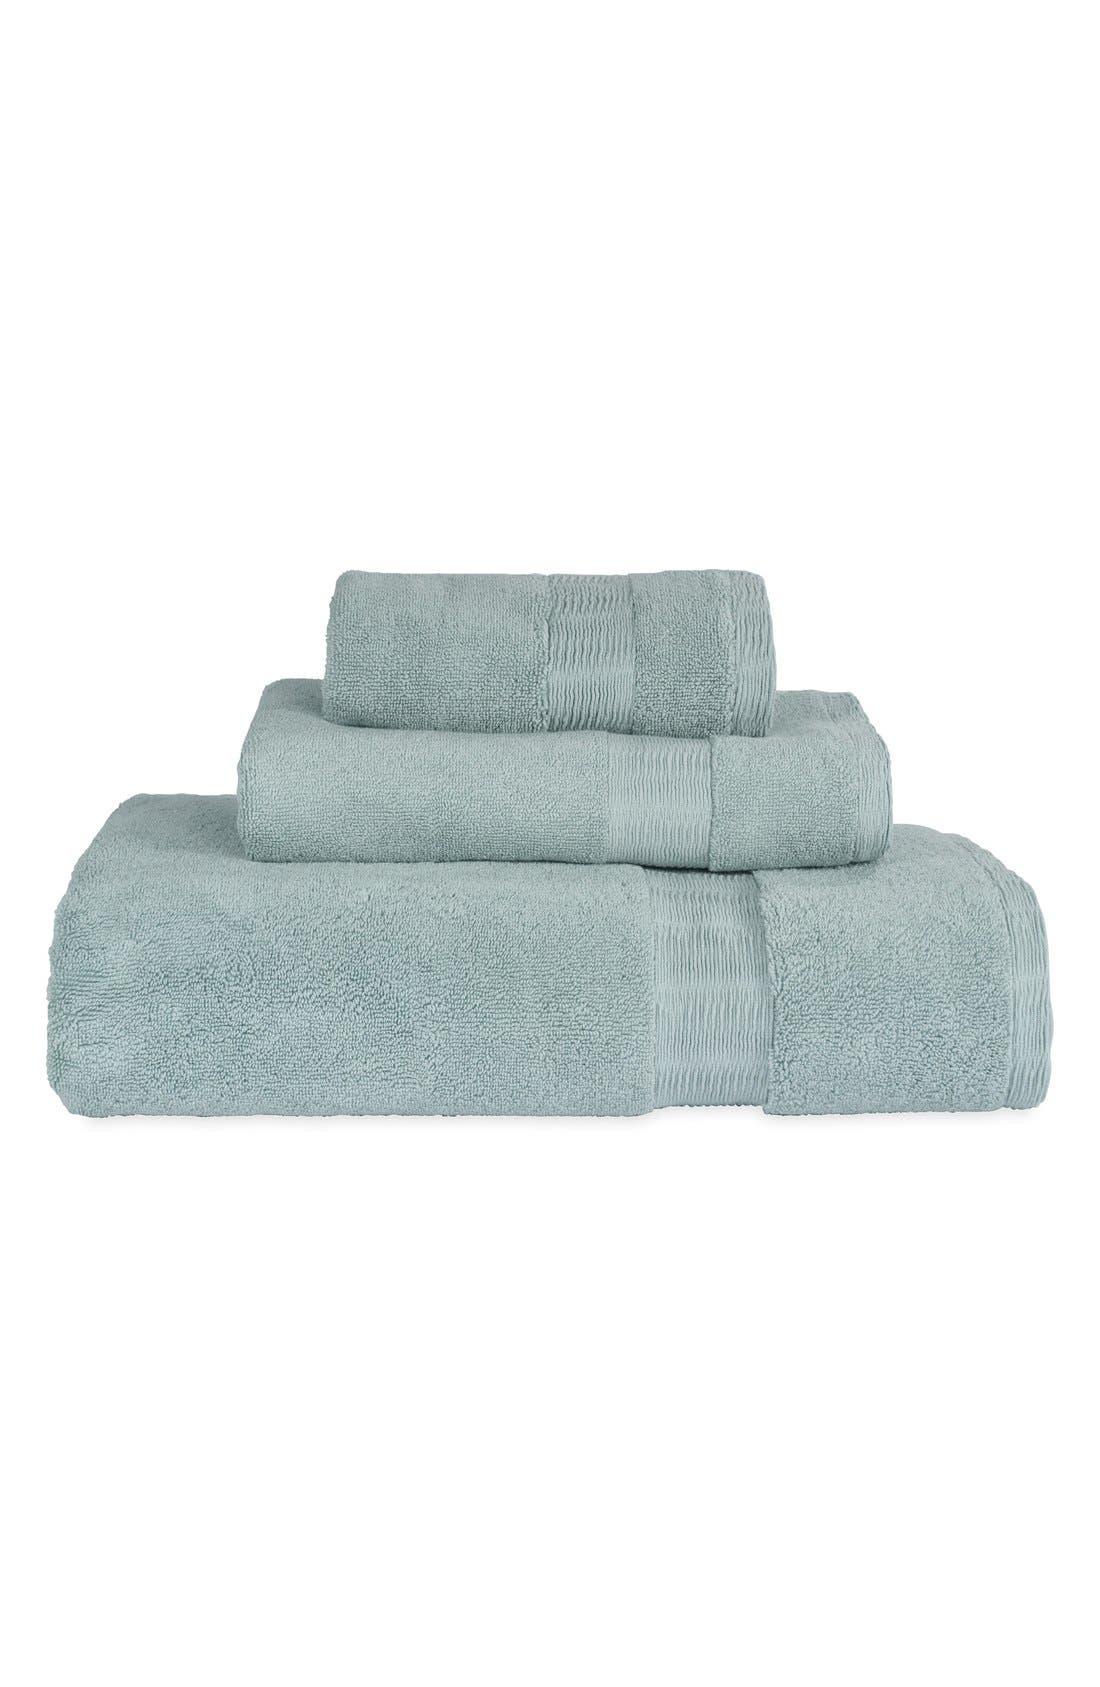 Mercer Wash Towel,                             Alternate thumbnail 2, color,                             Mist